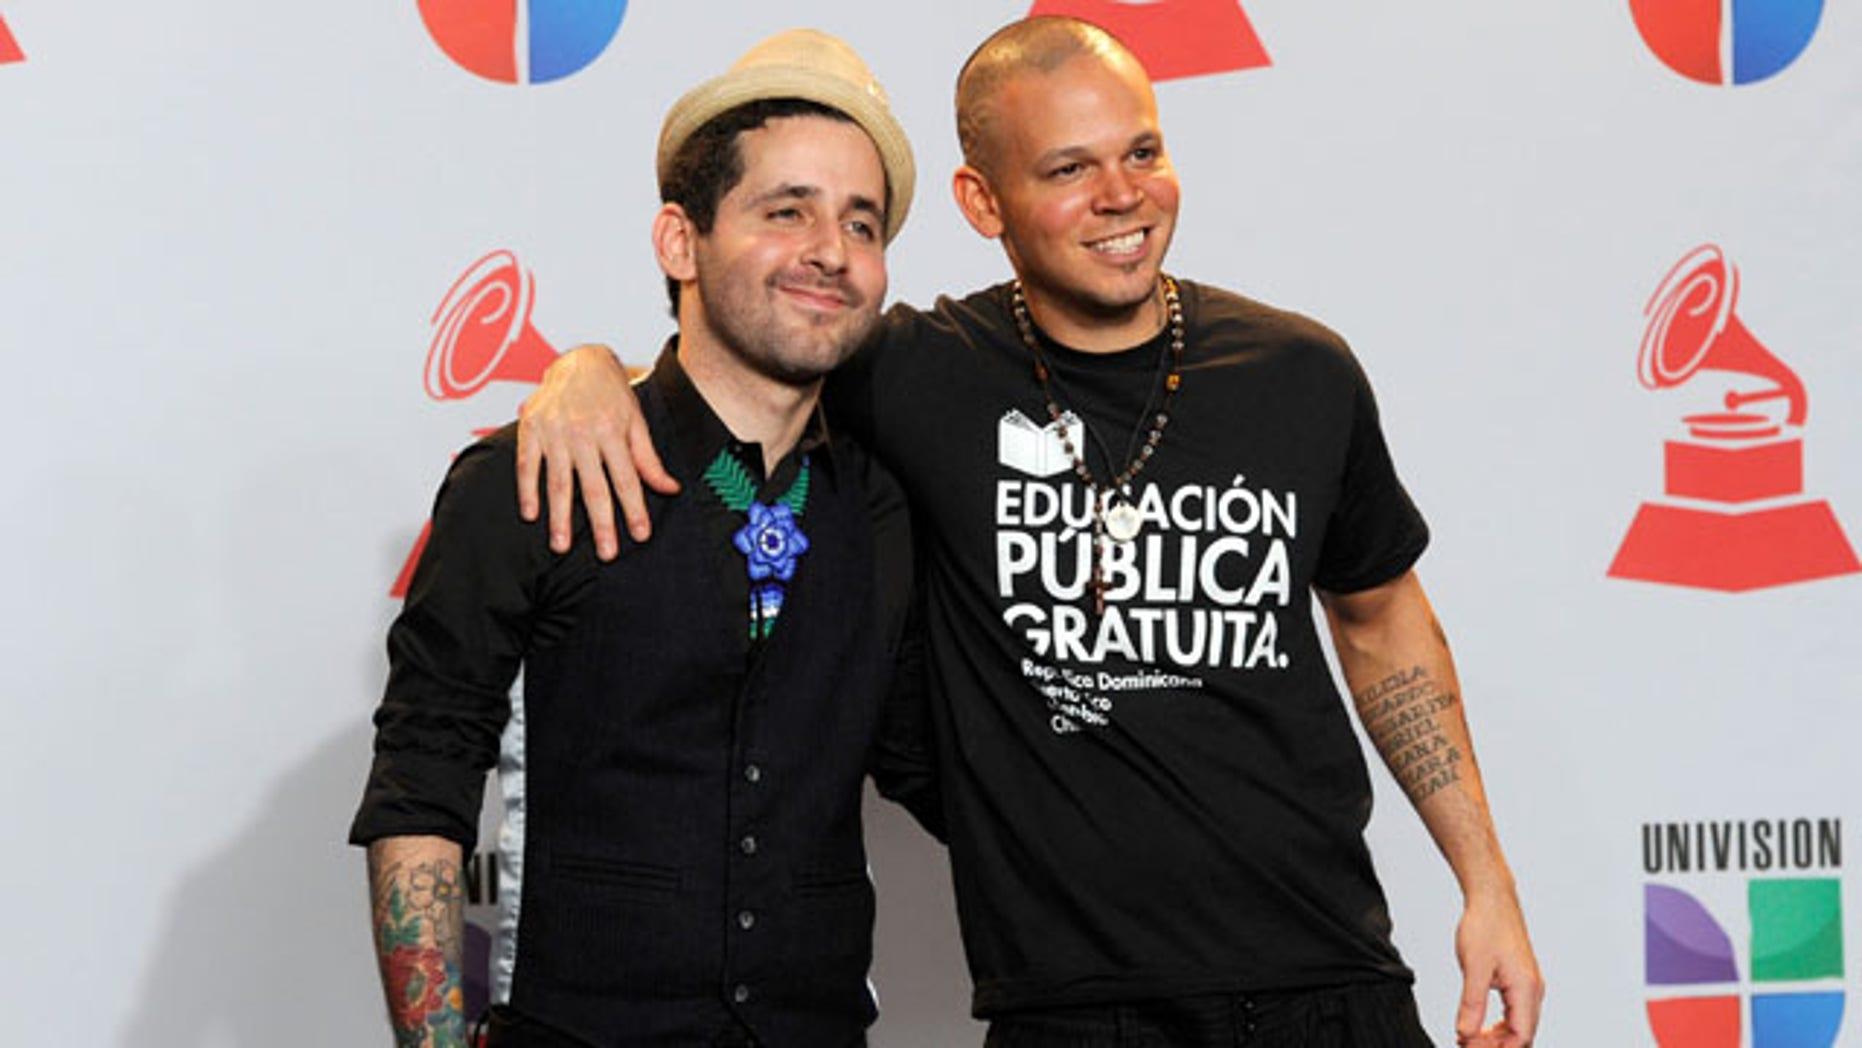 Rene Perez, right